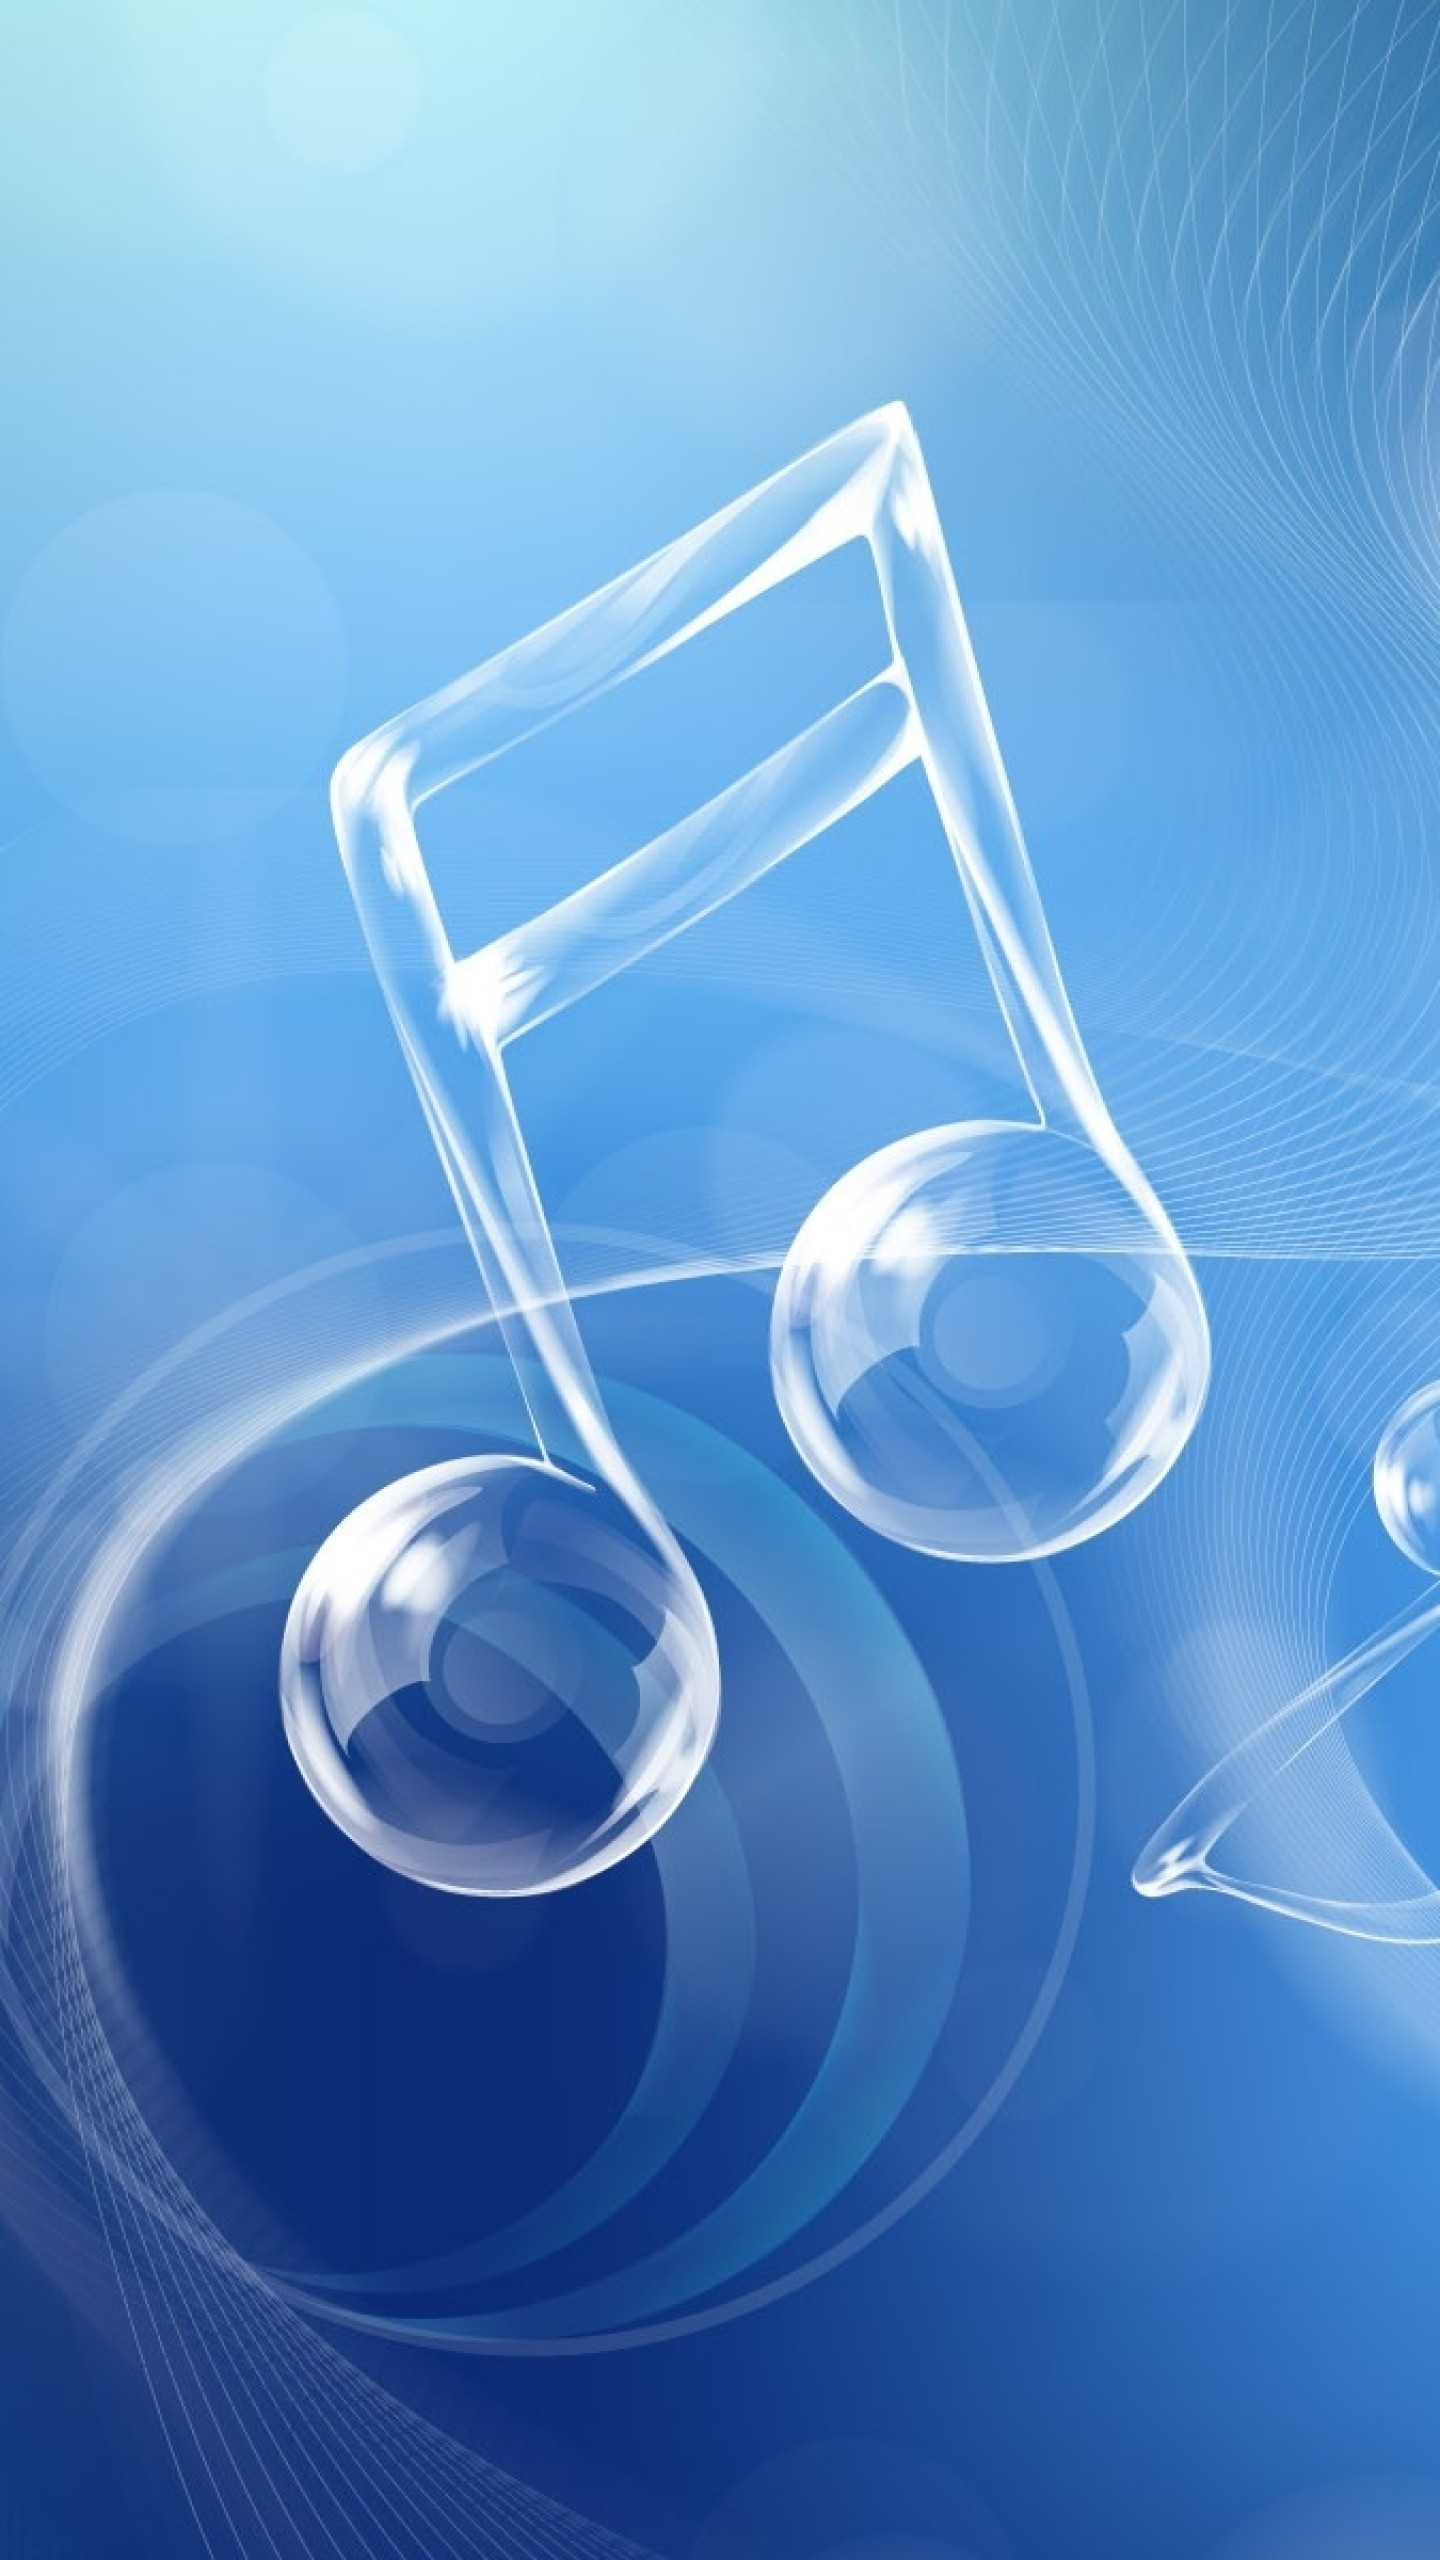 Wallpaper blue, white, music, shapes